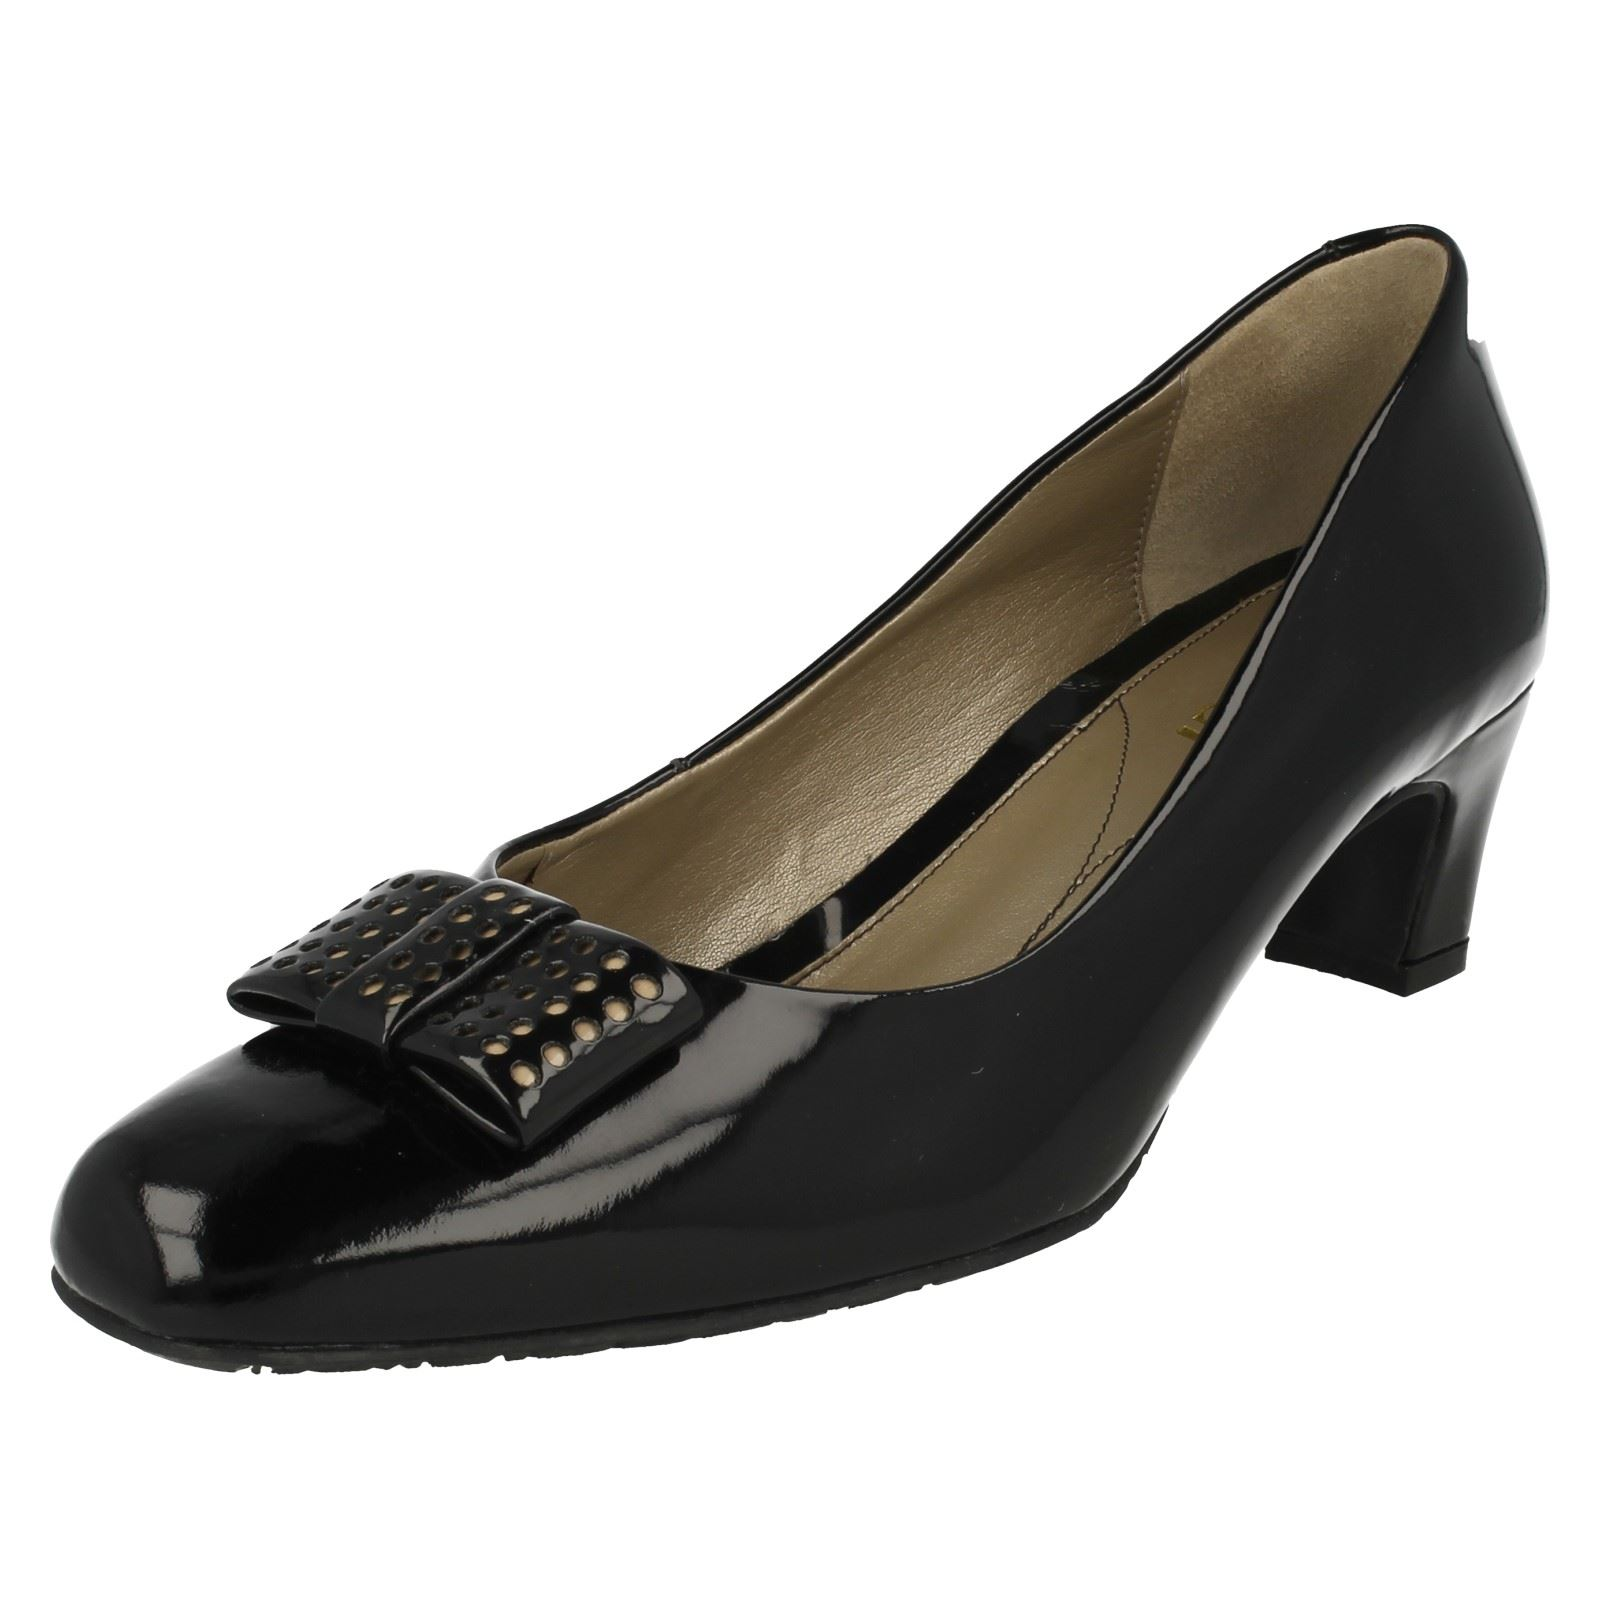 Femmes Van Dal Dal Dal Chaussures à * HELENA * 517292